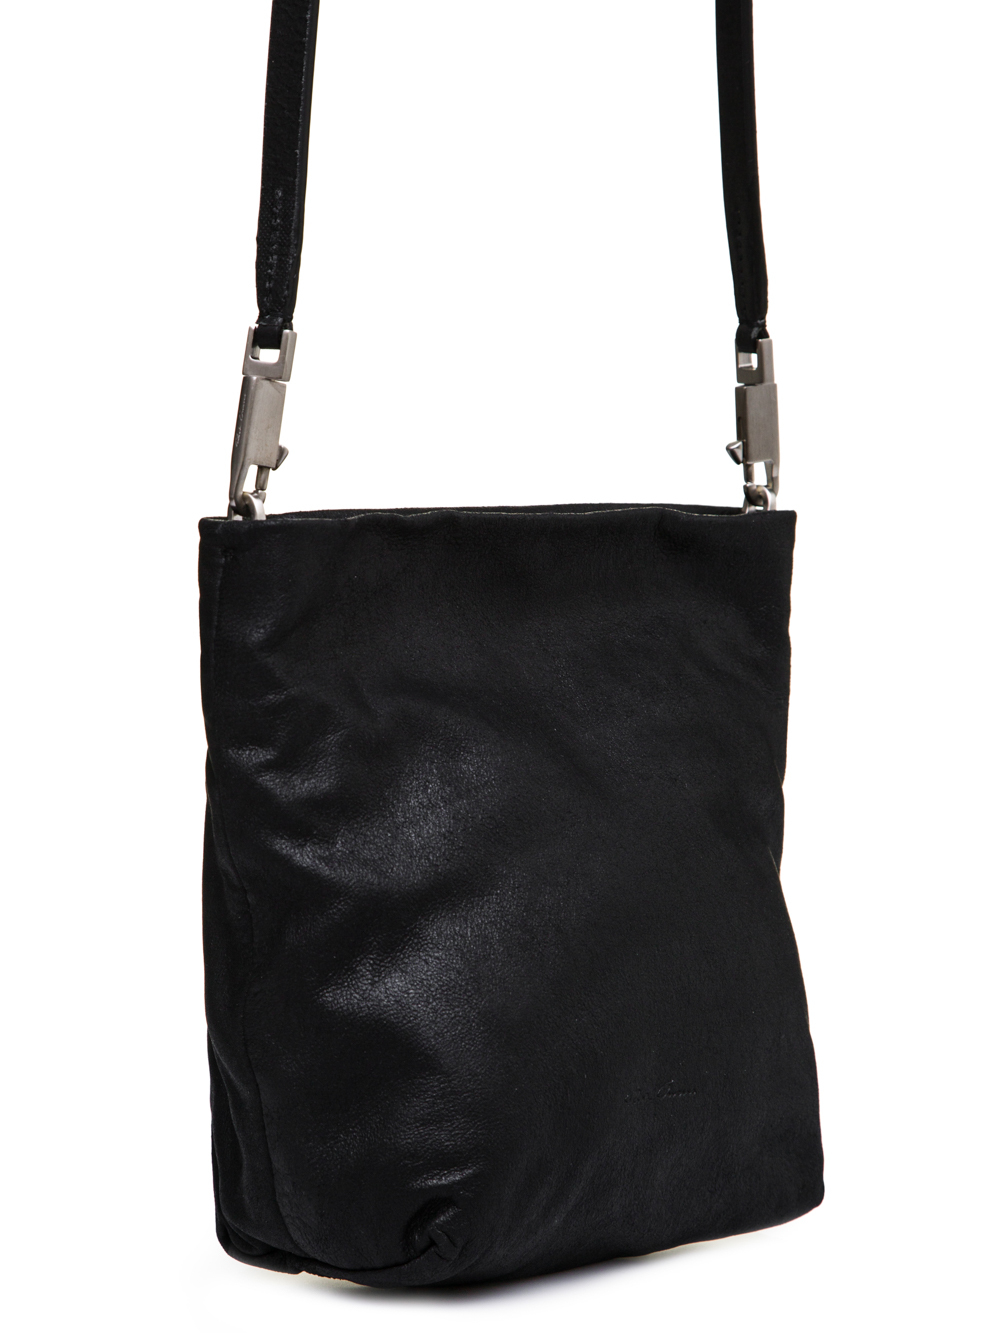 RICK OWENS FW18 SISYPHUS SMALL ADRI BAG IN BLACK OILY BLISTER LAMB LEATHER